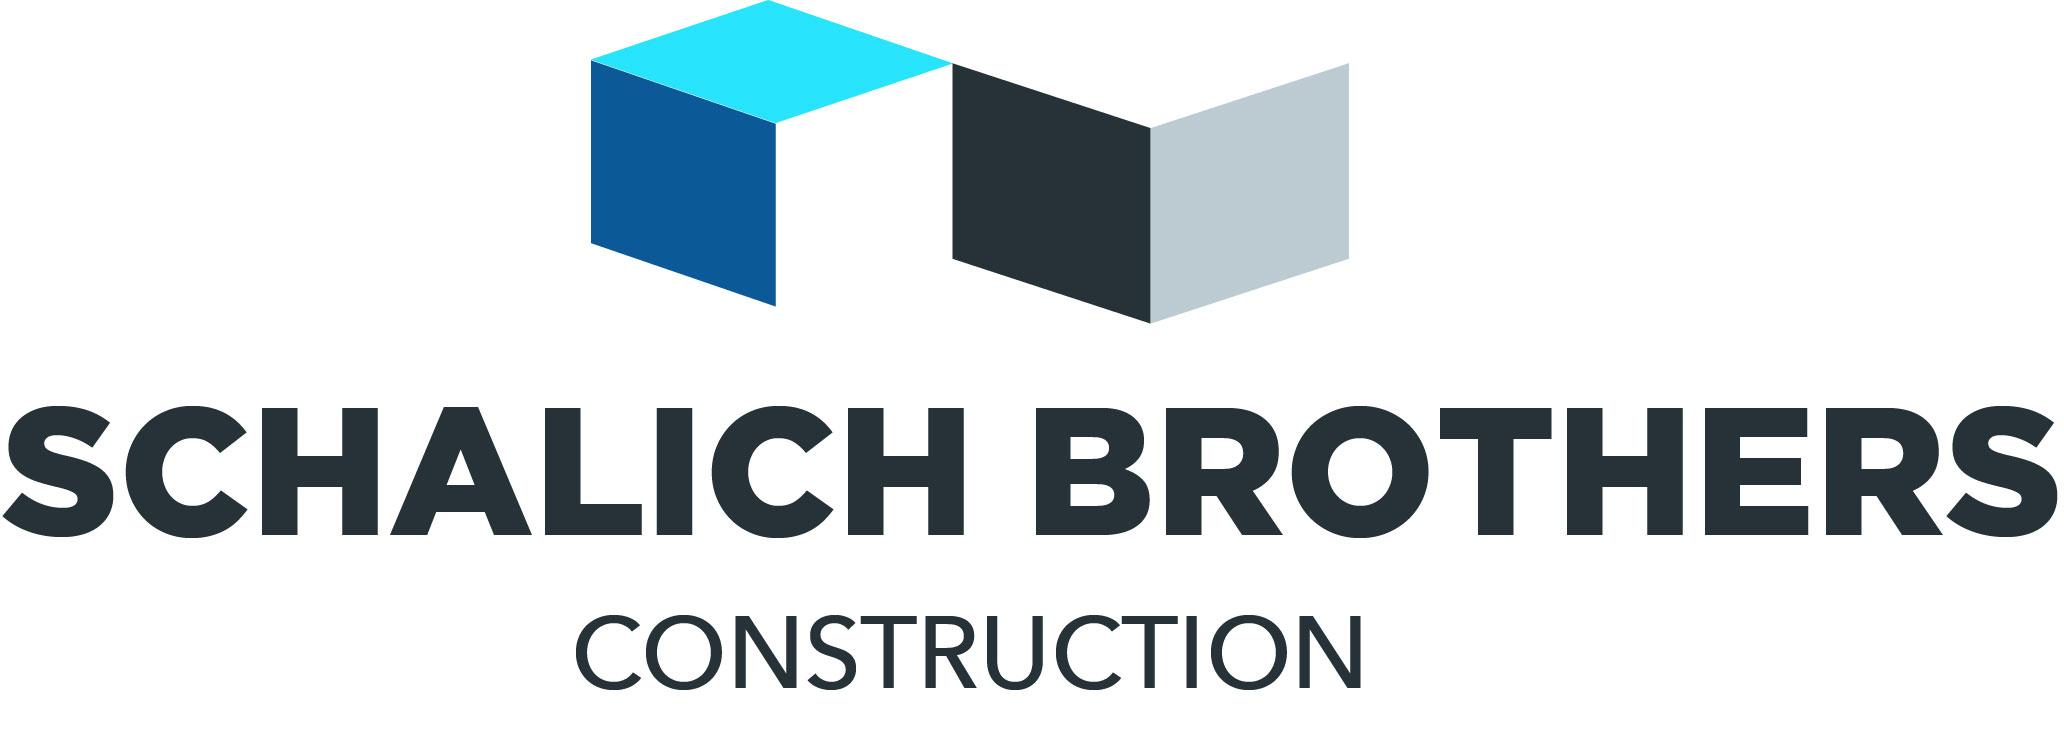 Schalich Brothers Construction